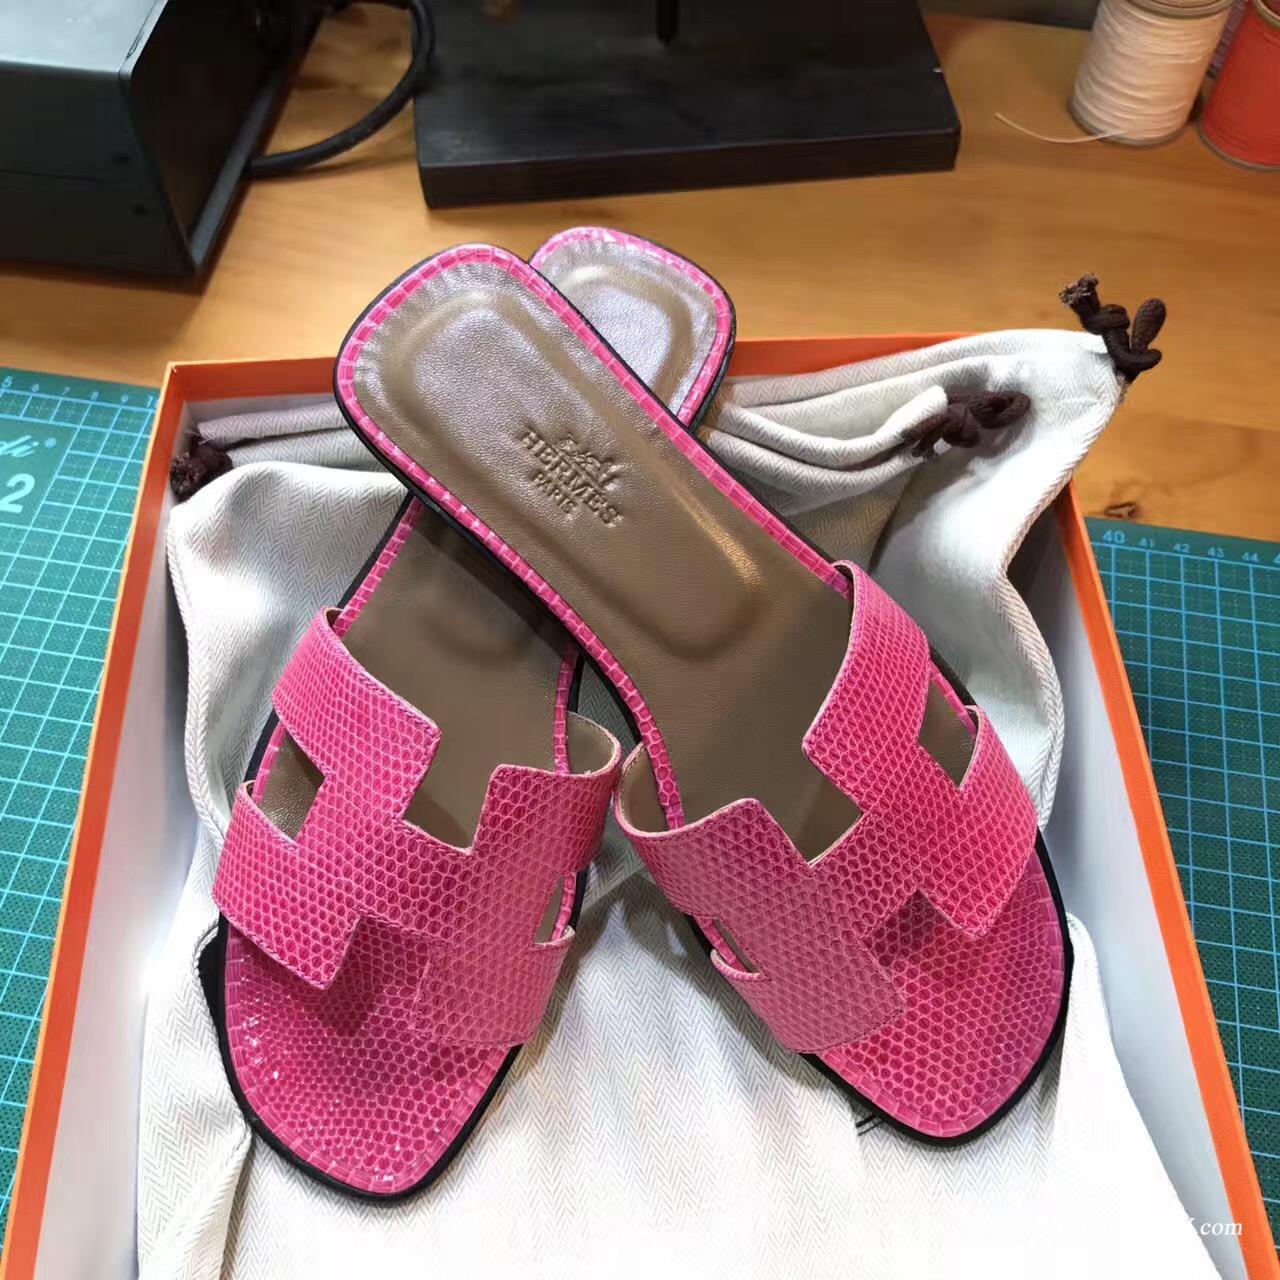 Hermes女士涼鞋 H型拖鞋蜥蜴皮 E5 Rose Tyrien糖果粉色 中跟 平底涼拖鞋